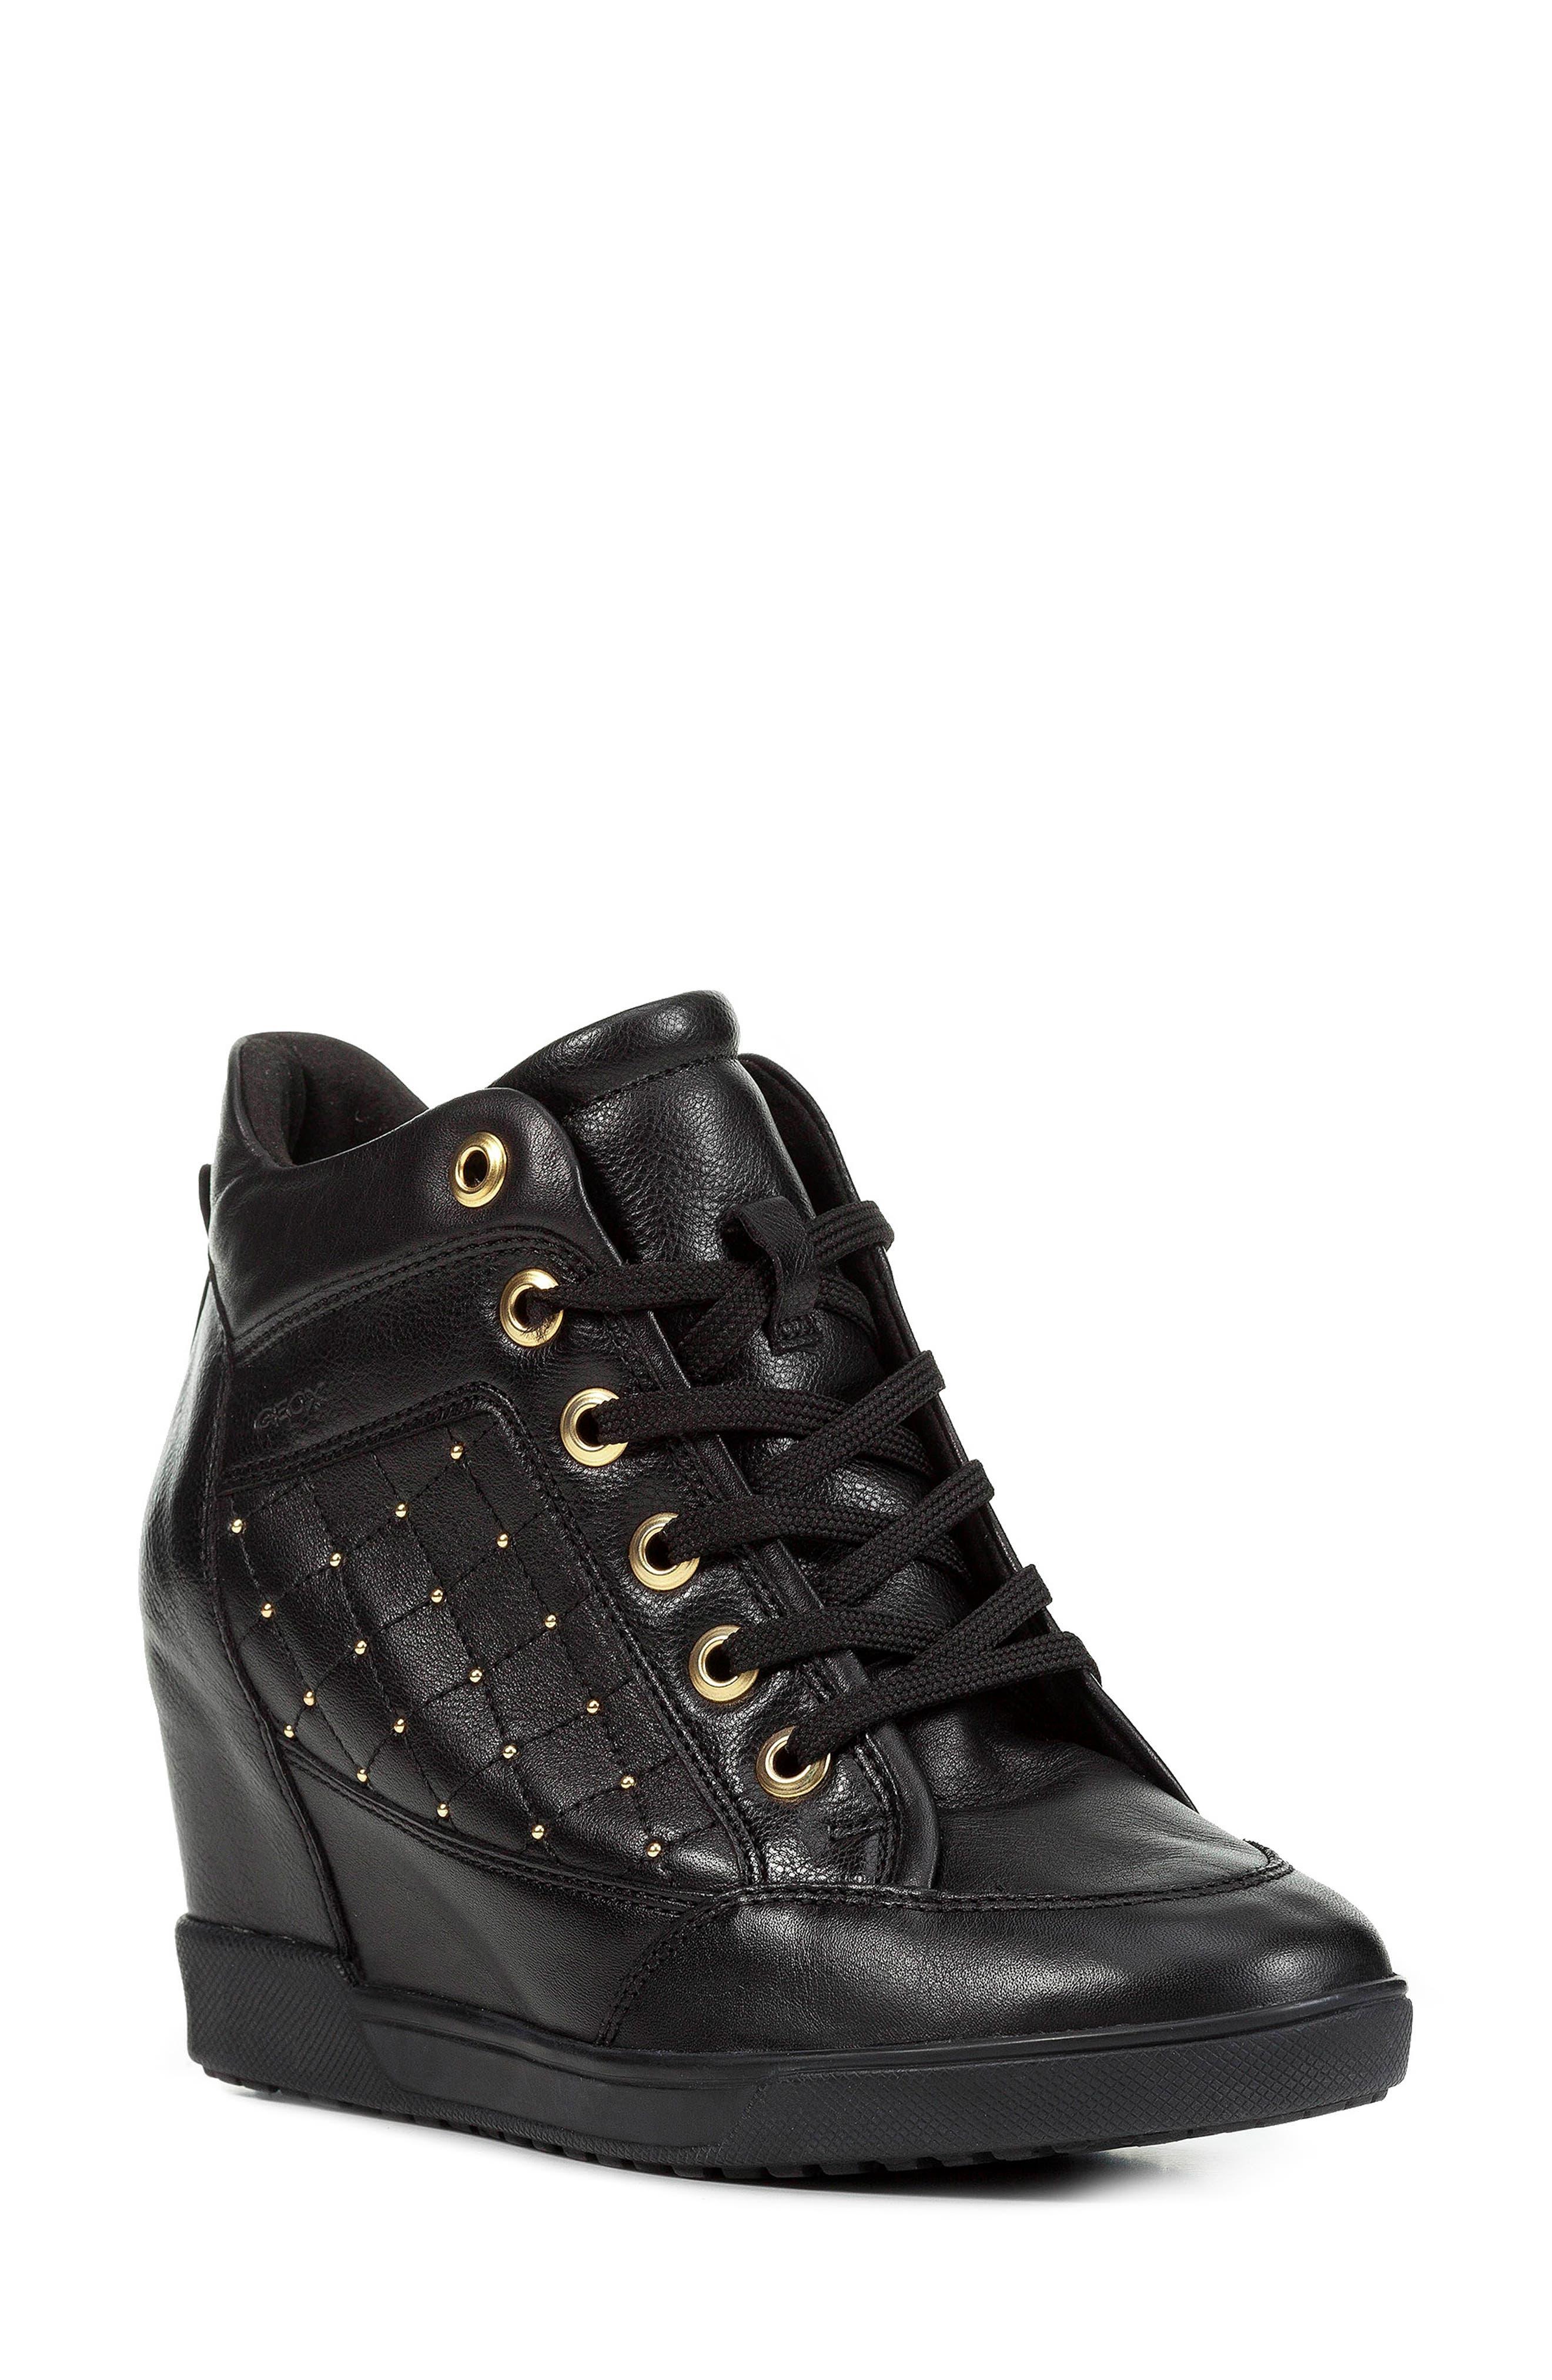 GEOX Carum Wedge Sneaker, Main, color, 001